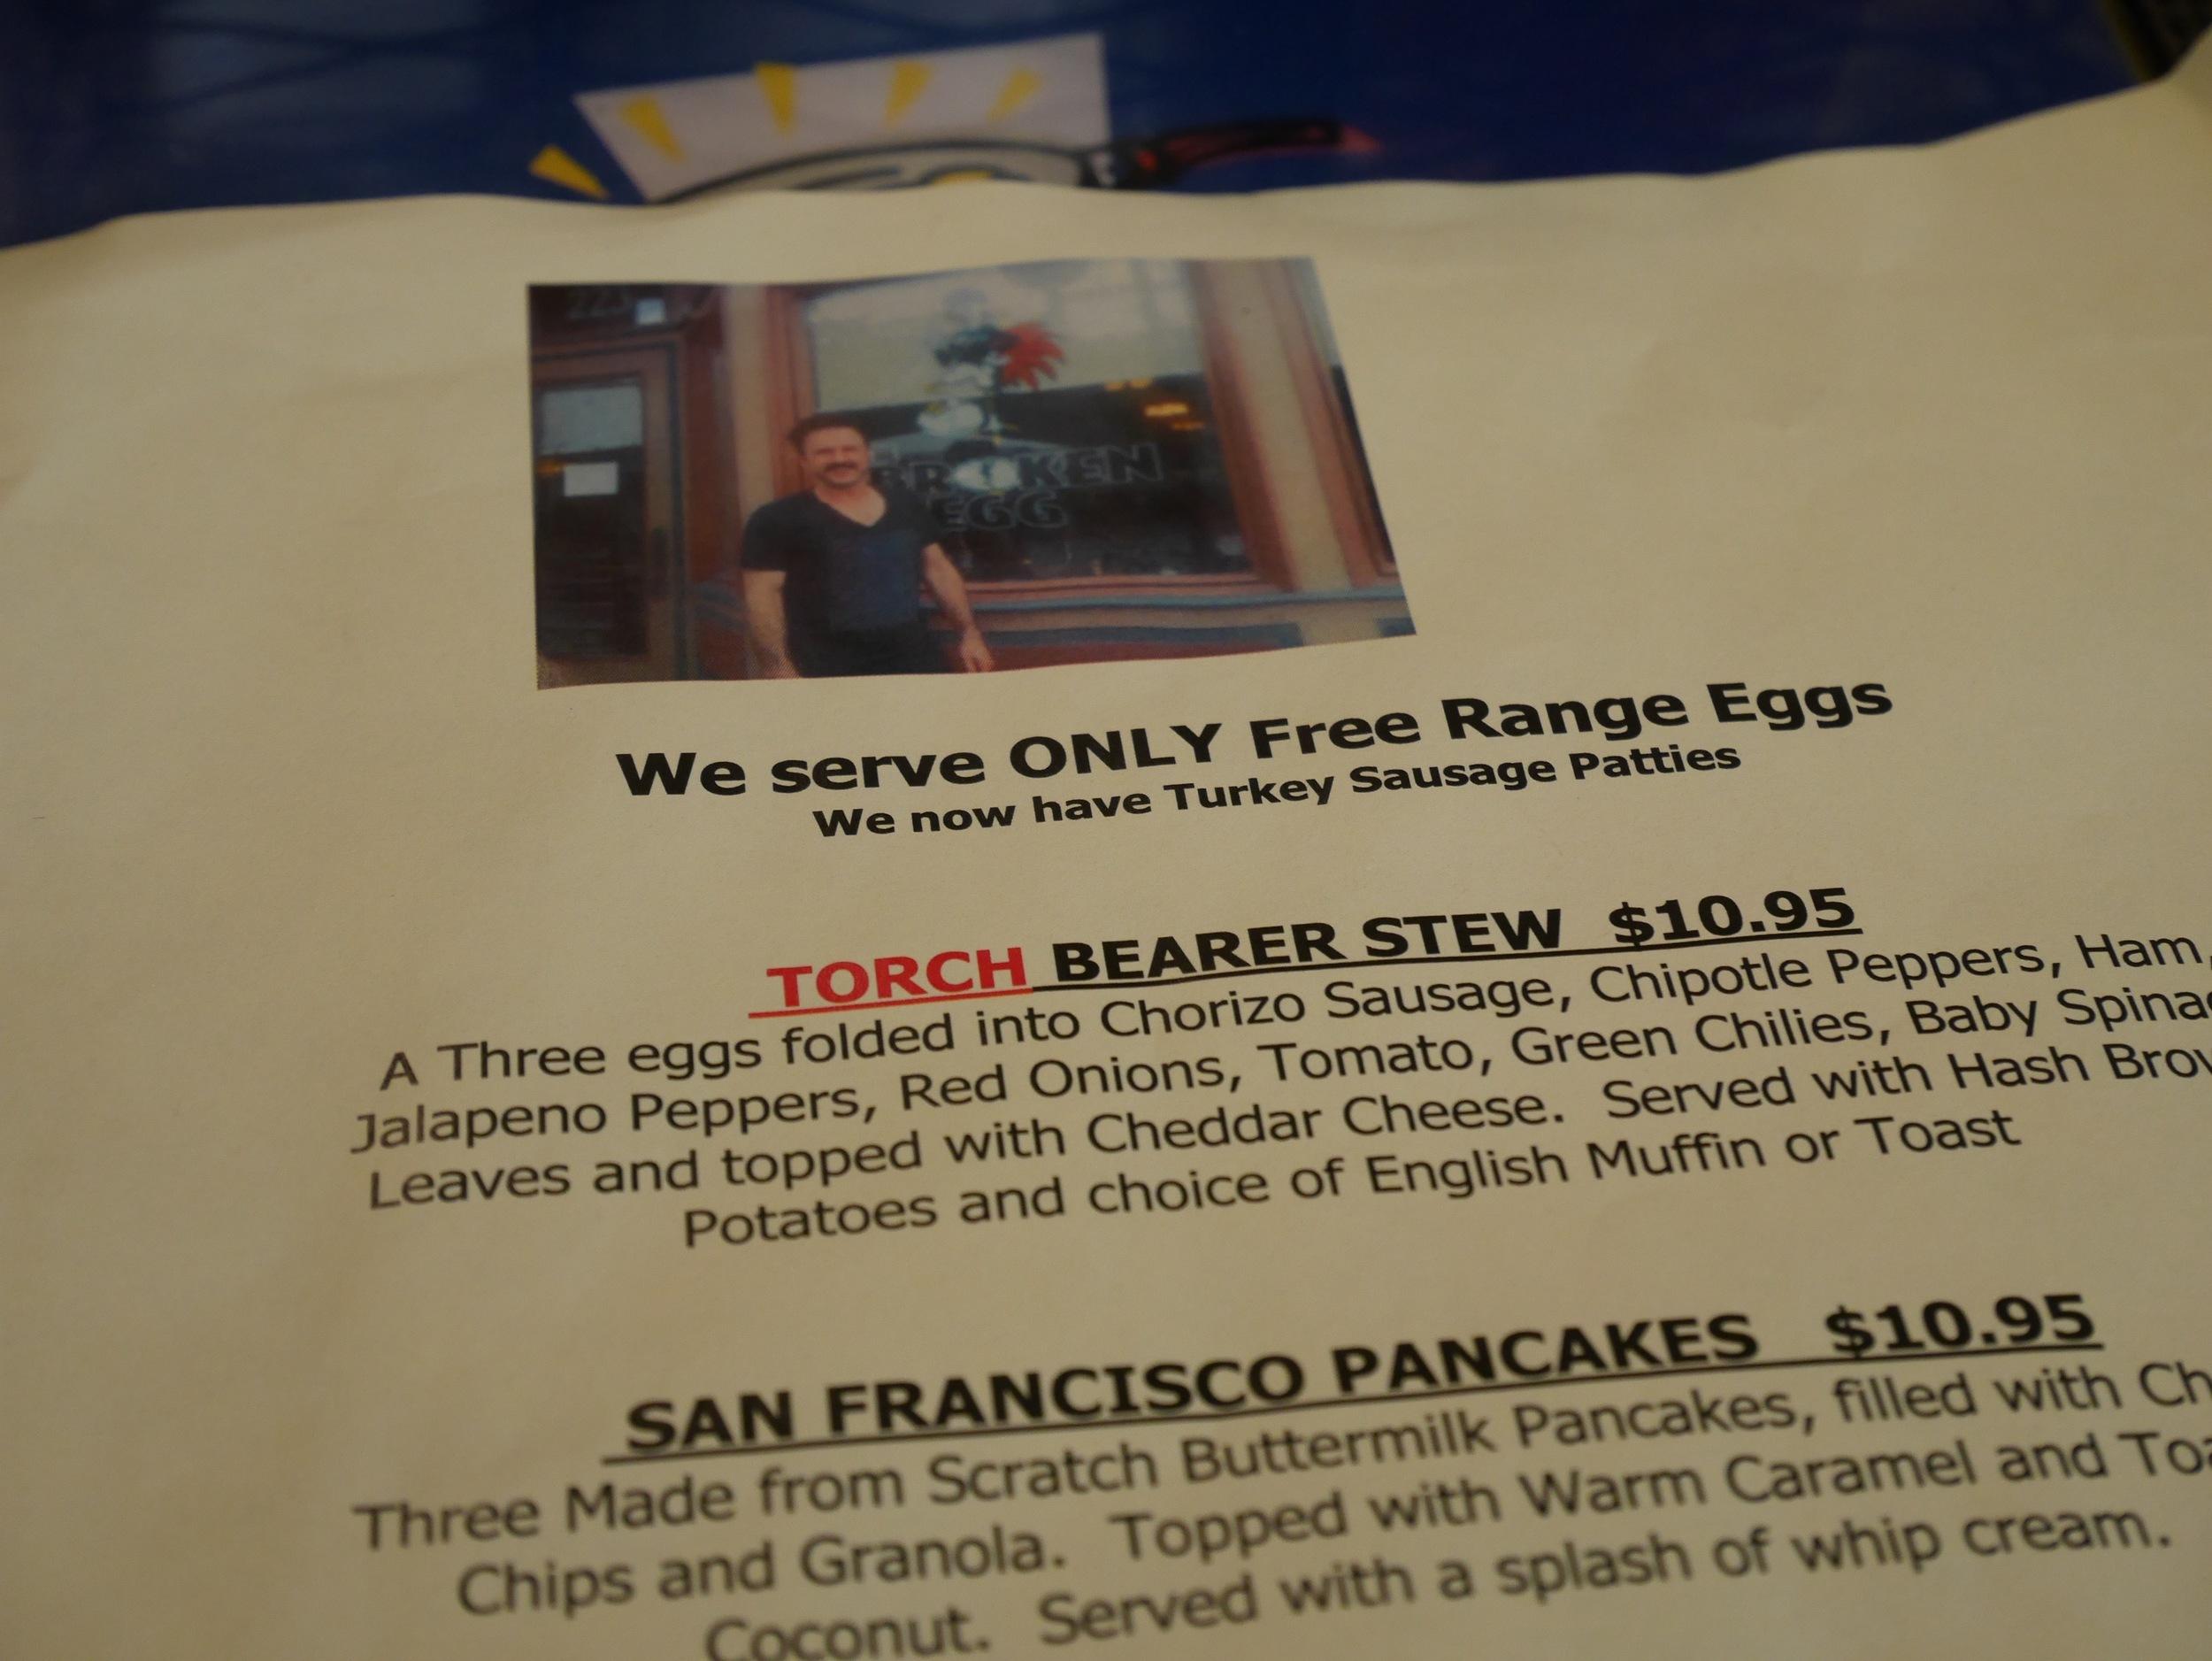 Random photo of David Arquette on The Broken Egg specials menu - get the classic eggs, bacon, english muffin breakfast